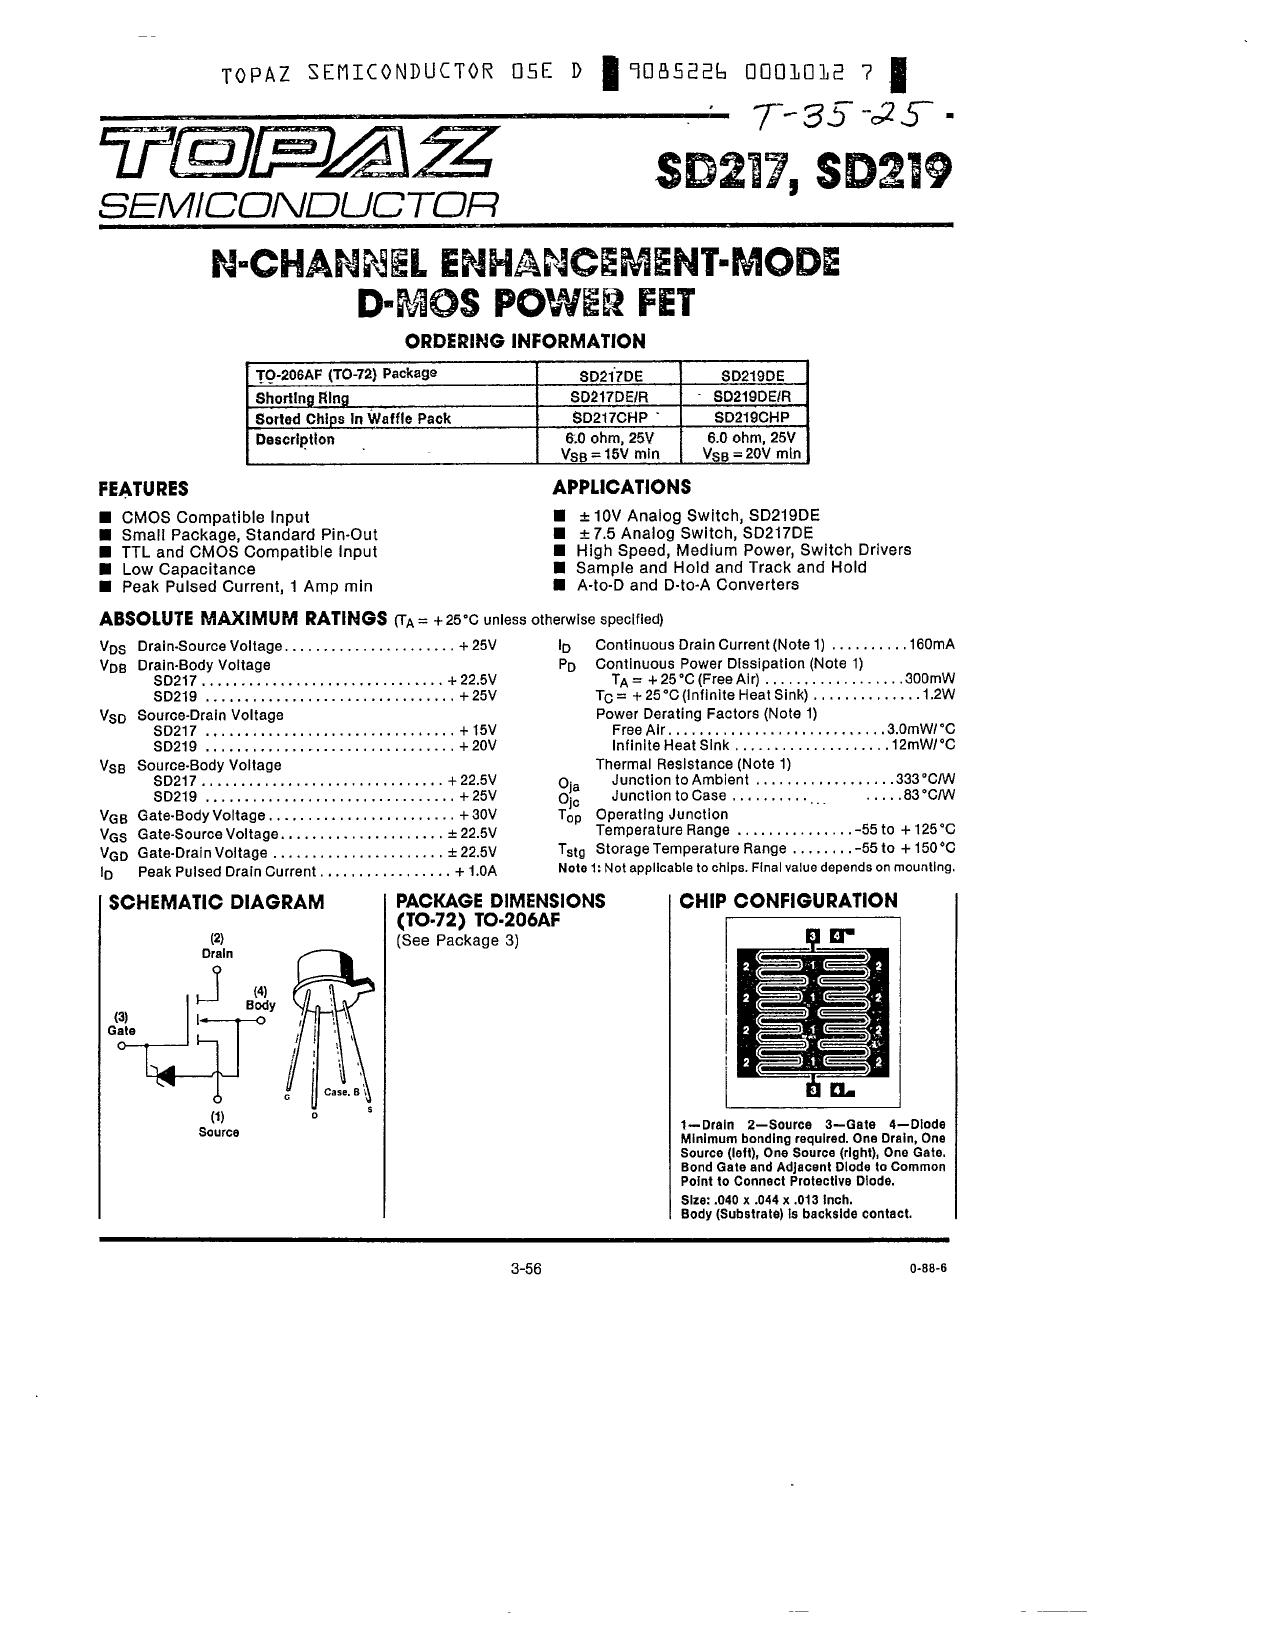 SD219 دیتاشیت PDF